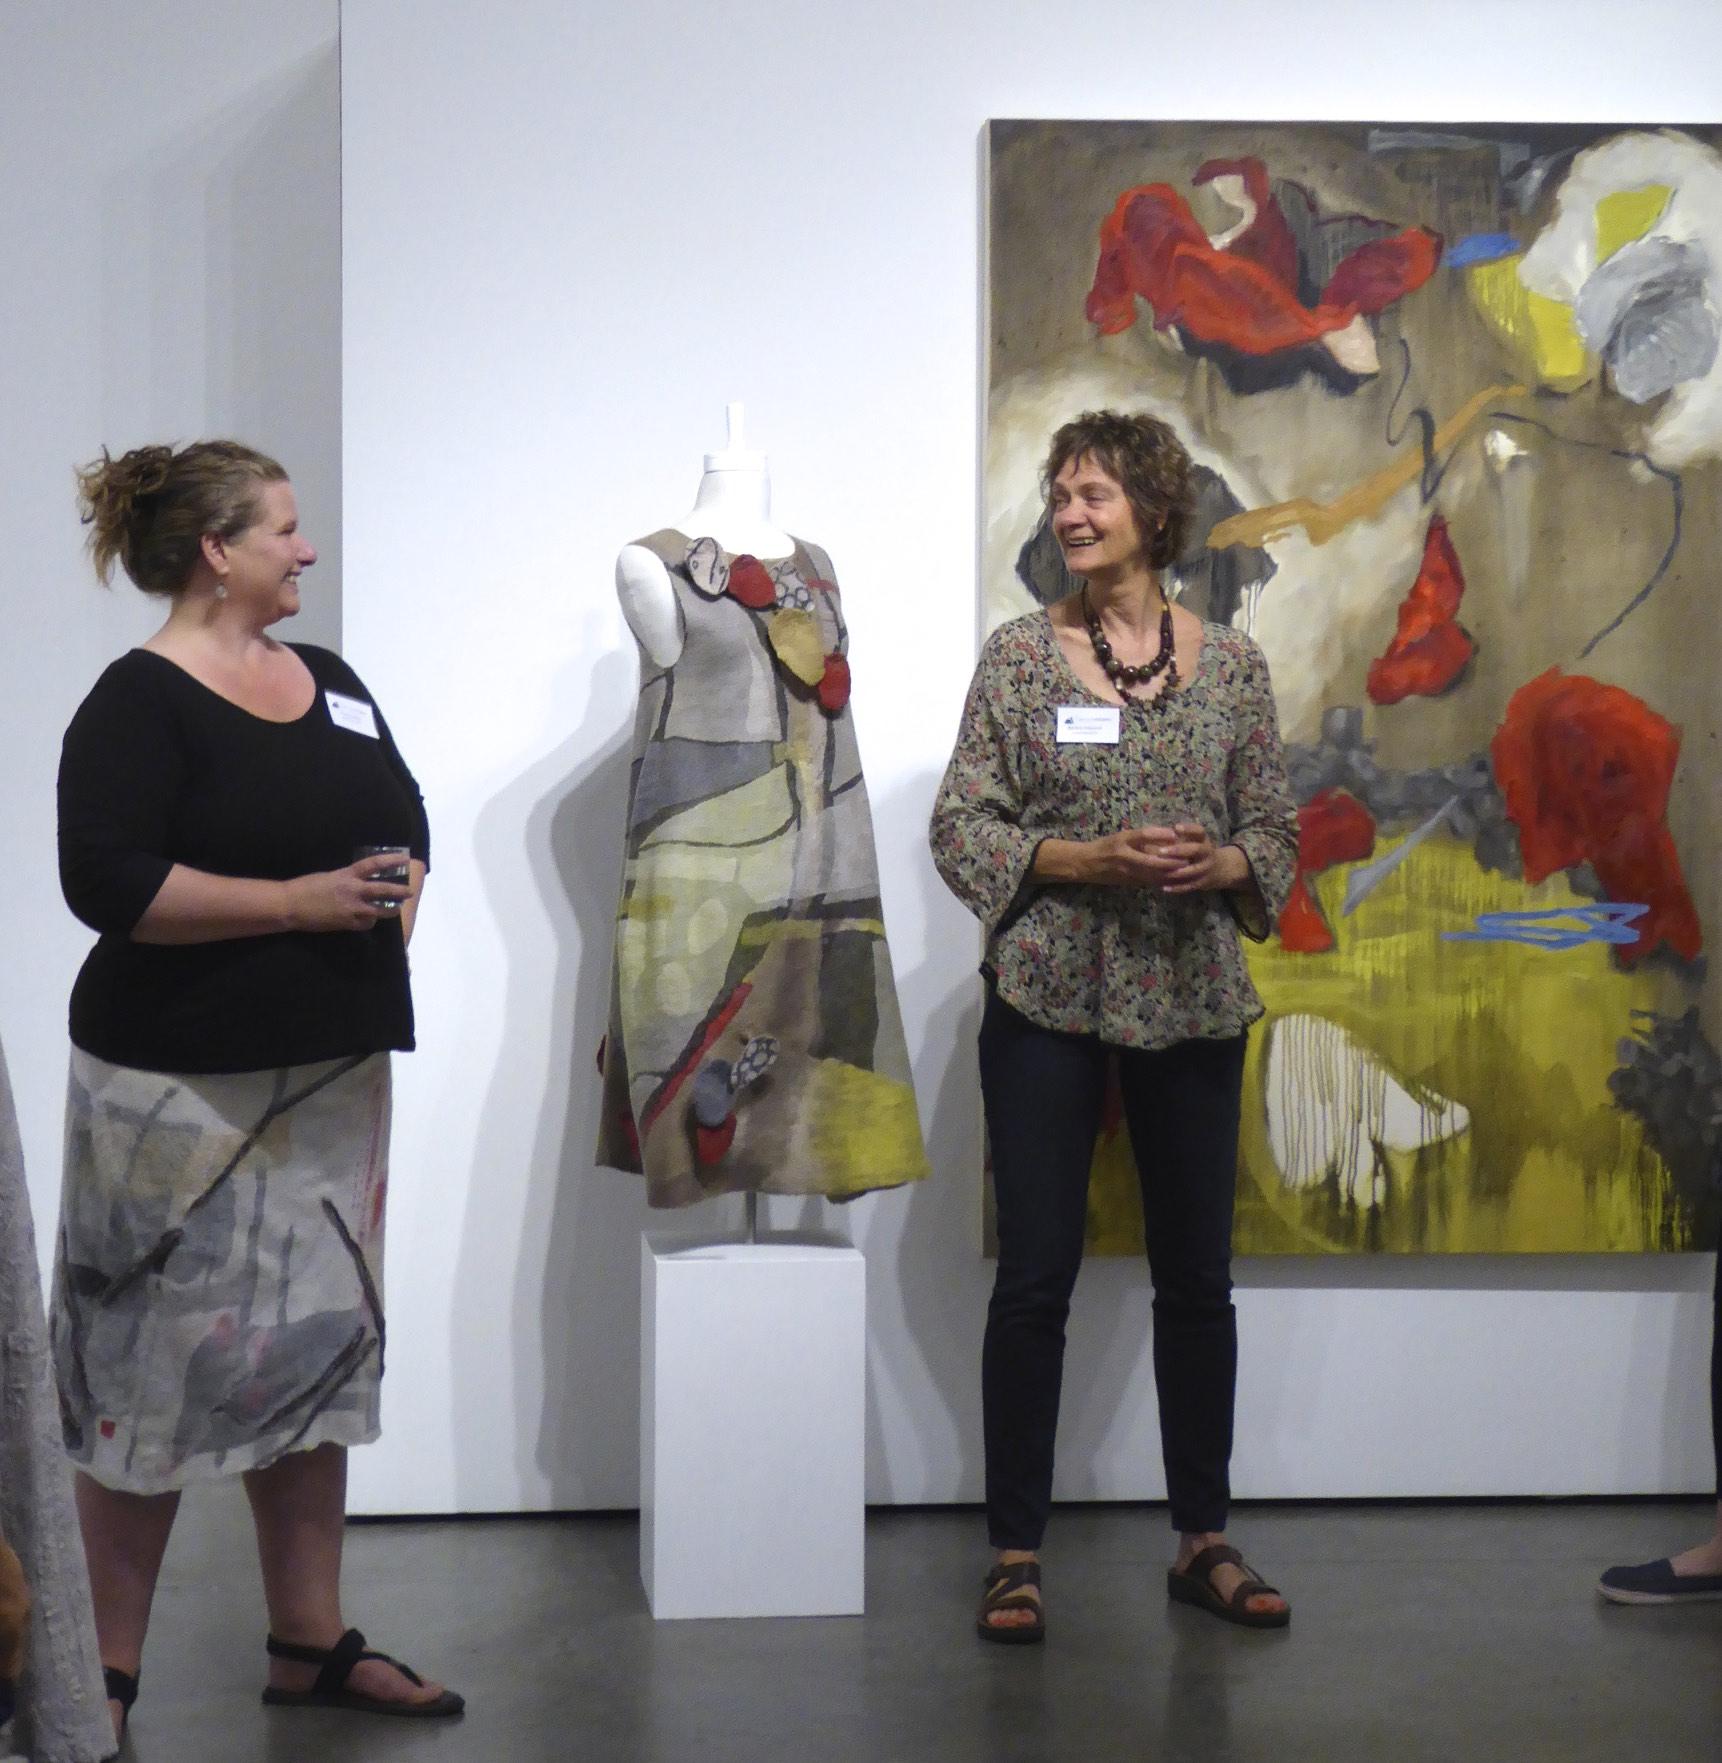 Seymour art gallery, shift exhibition Vancouver, artist talk, Canadian contemporary artist Barbra Edwards